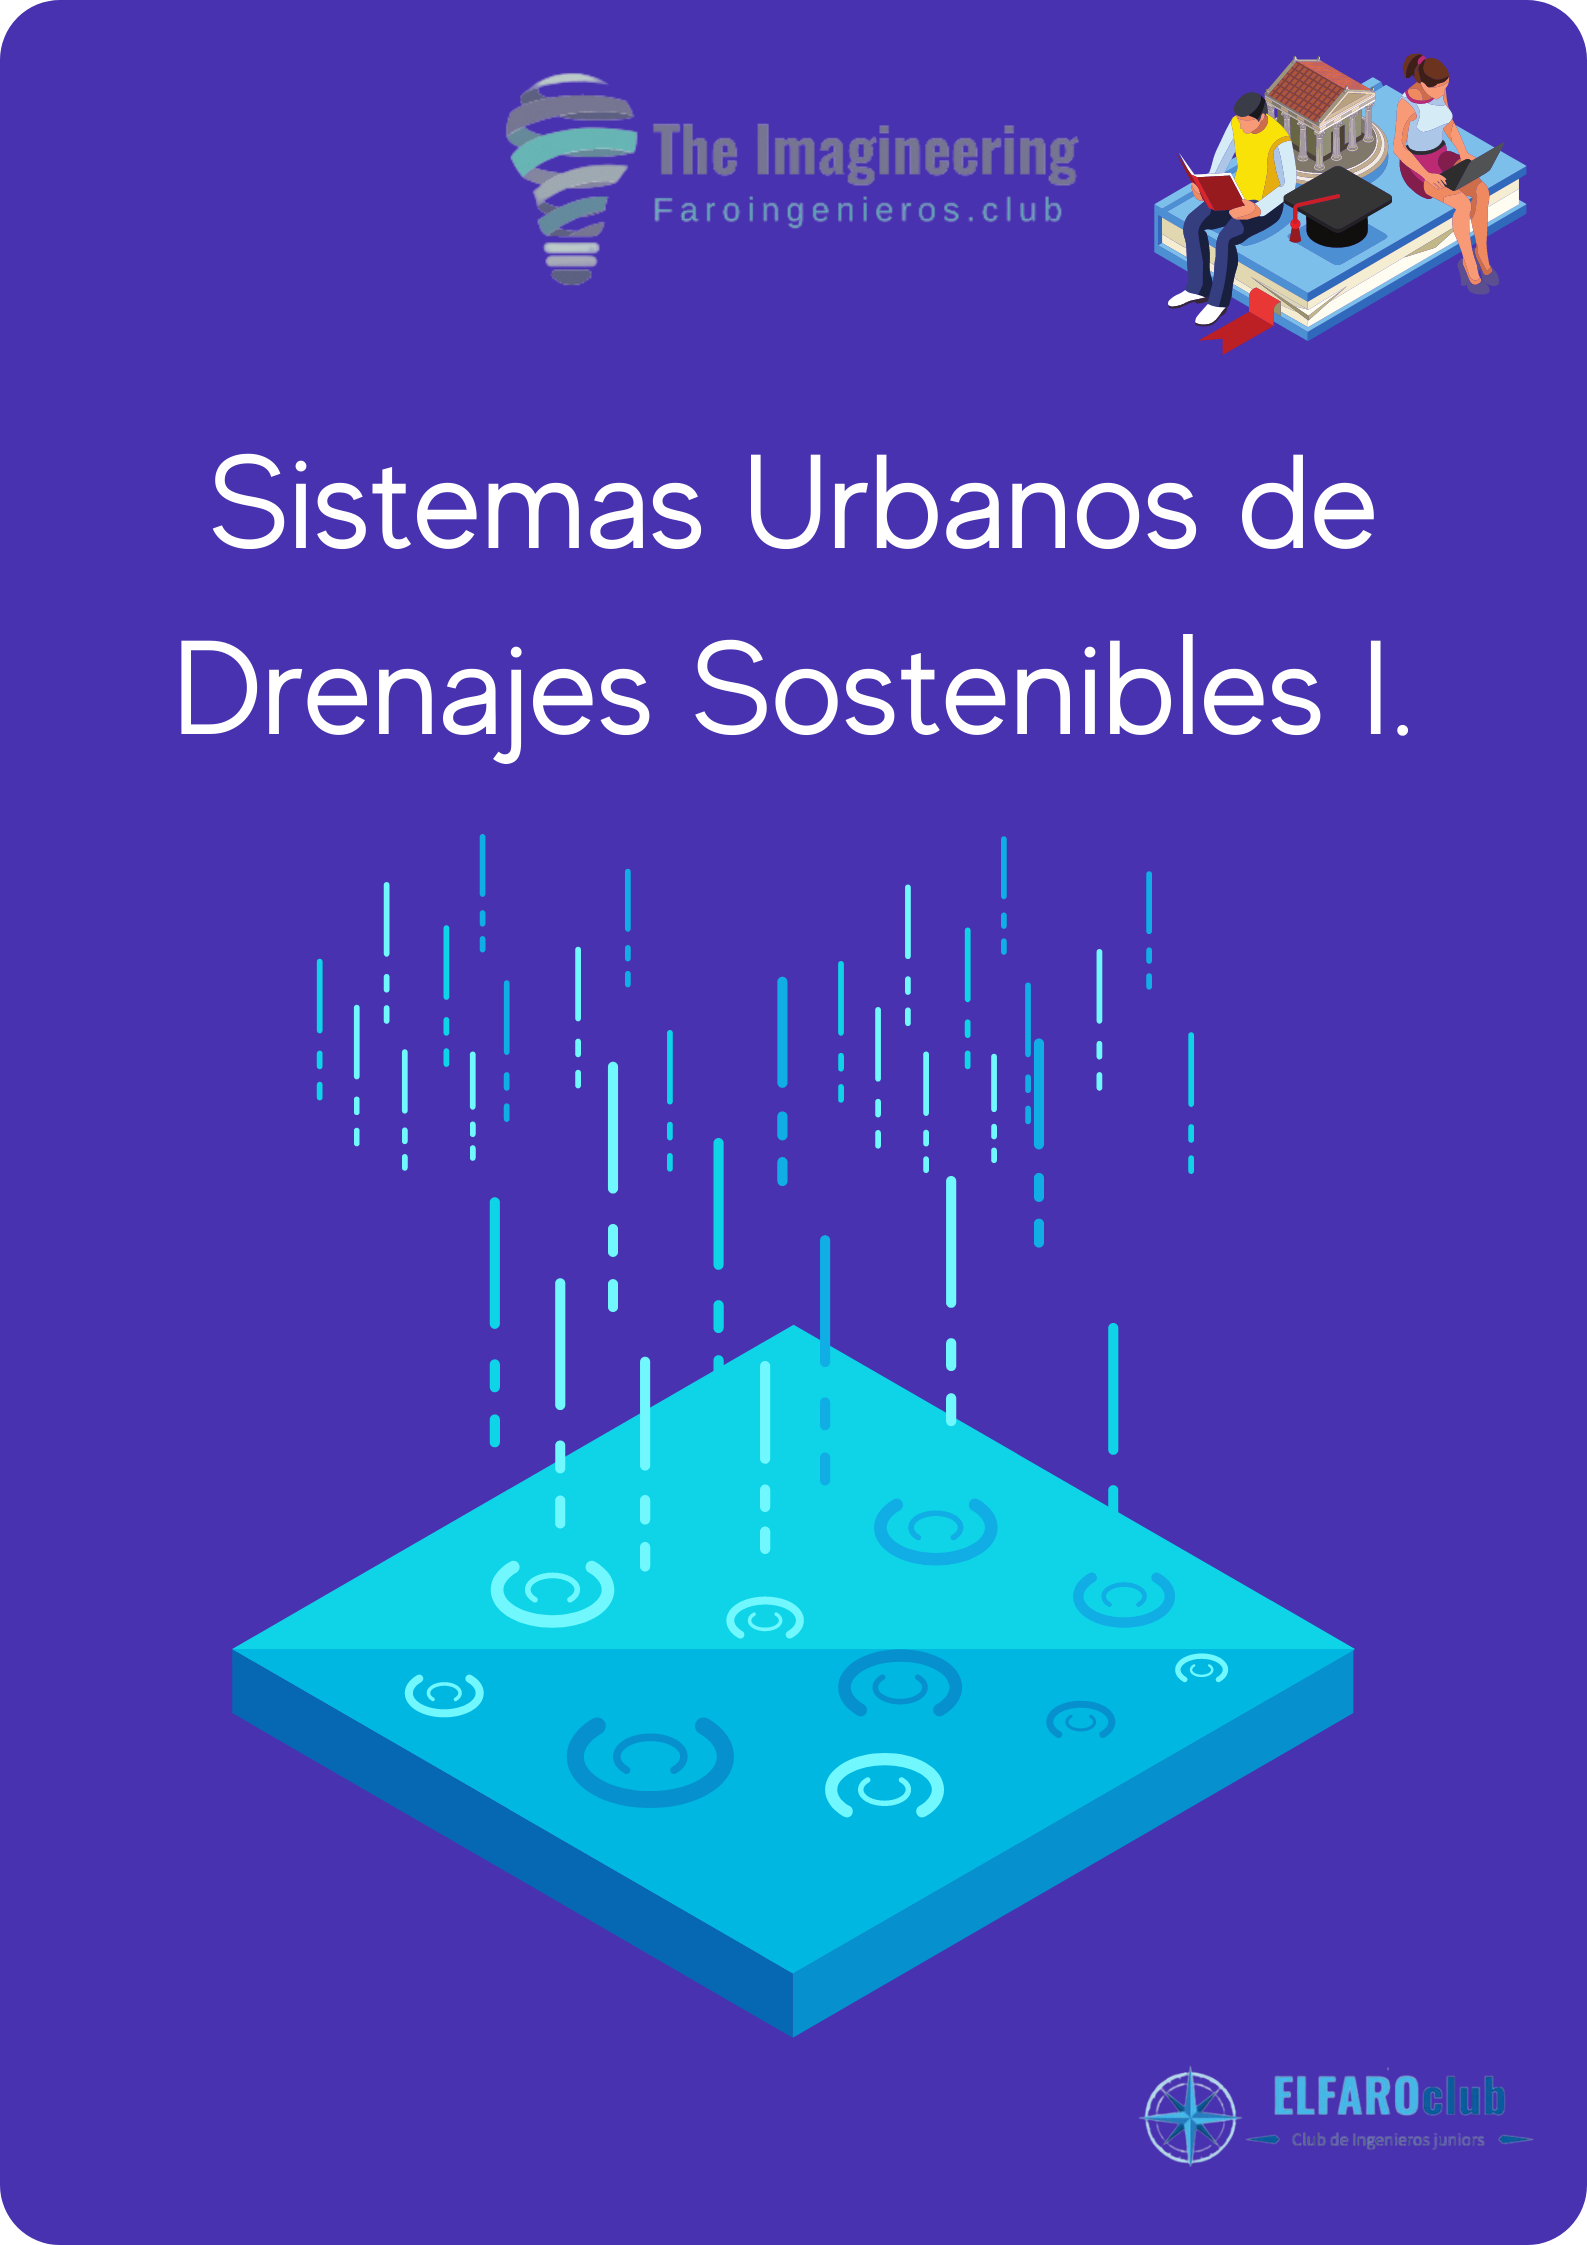 sistemas urbanos de drenaje